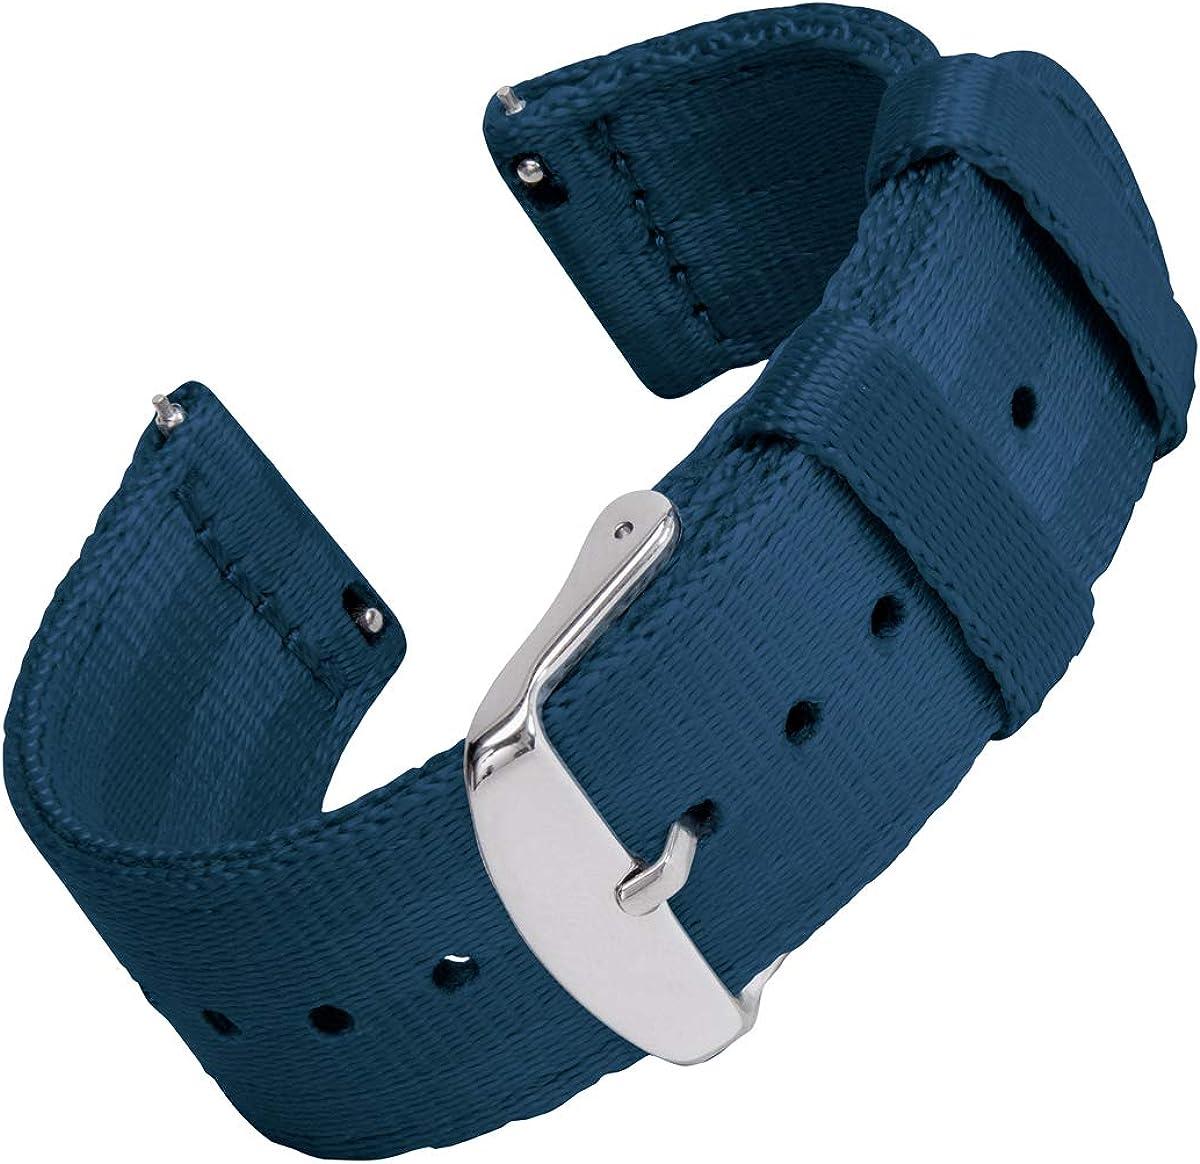 Archer Watch Straps - Seat Belt Nylon Quick Release Watch Bands   Multiple Colors, 18mm, 20mm, 22mm